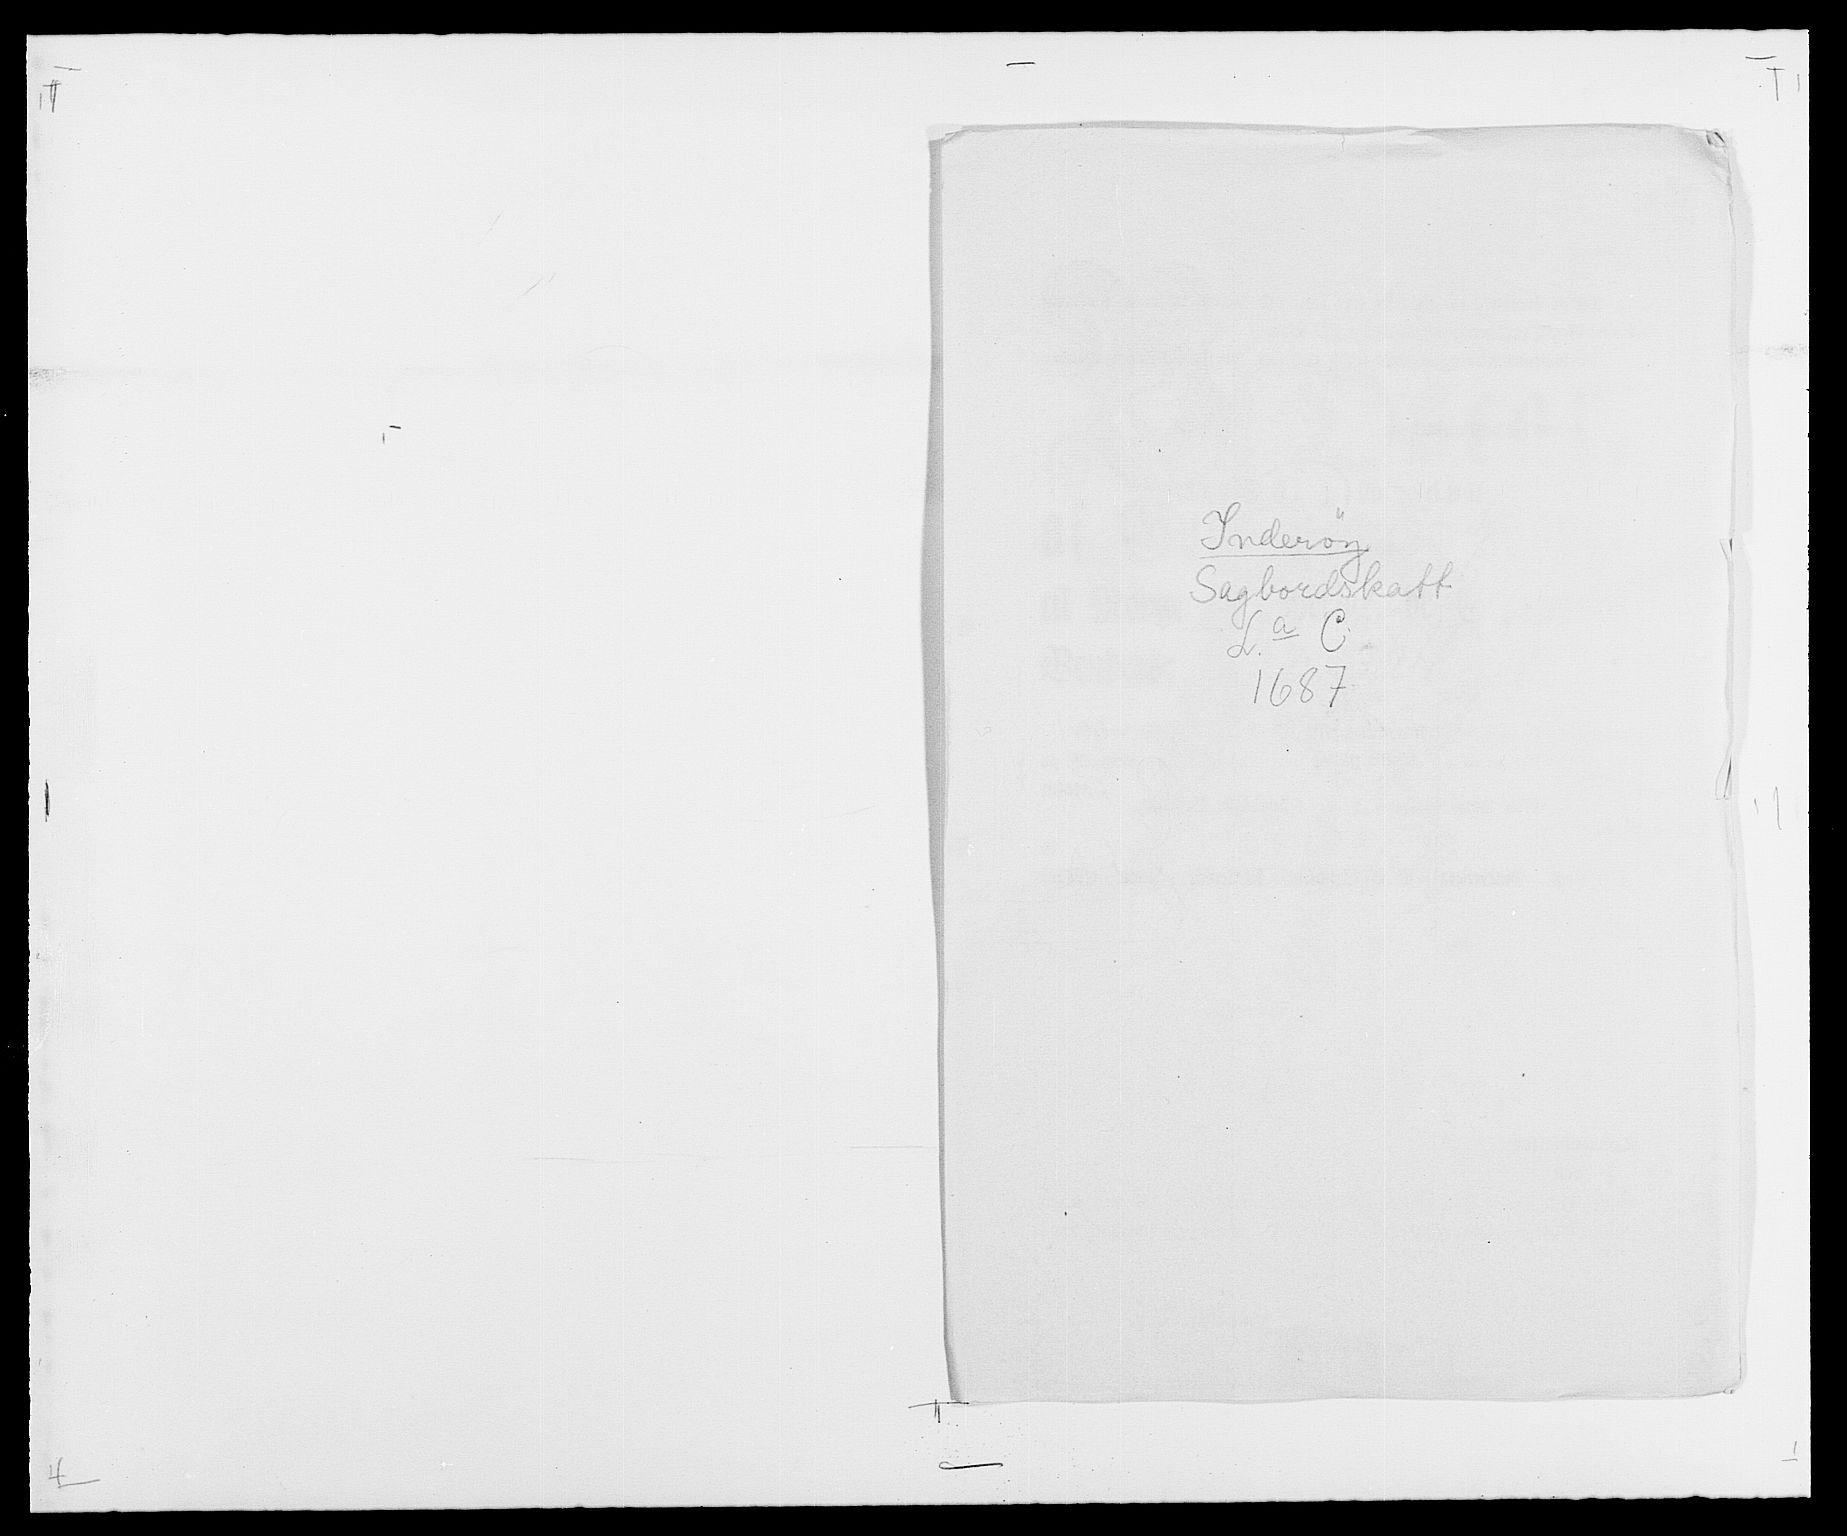 RA, Rentekammeret inntil 1814, Reviderte regnskaper, Fogderegnskap, R63/L4306: Fogderegnskap Inderøy, 1687-1689, s. 81